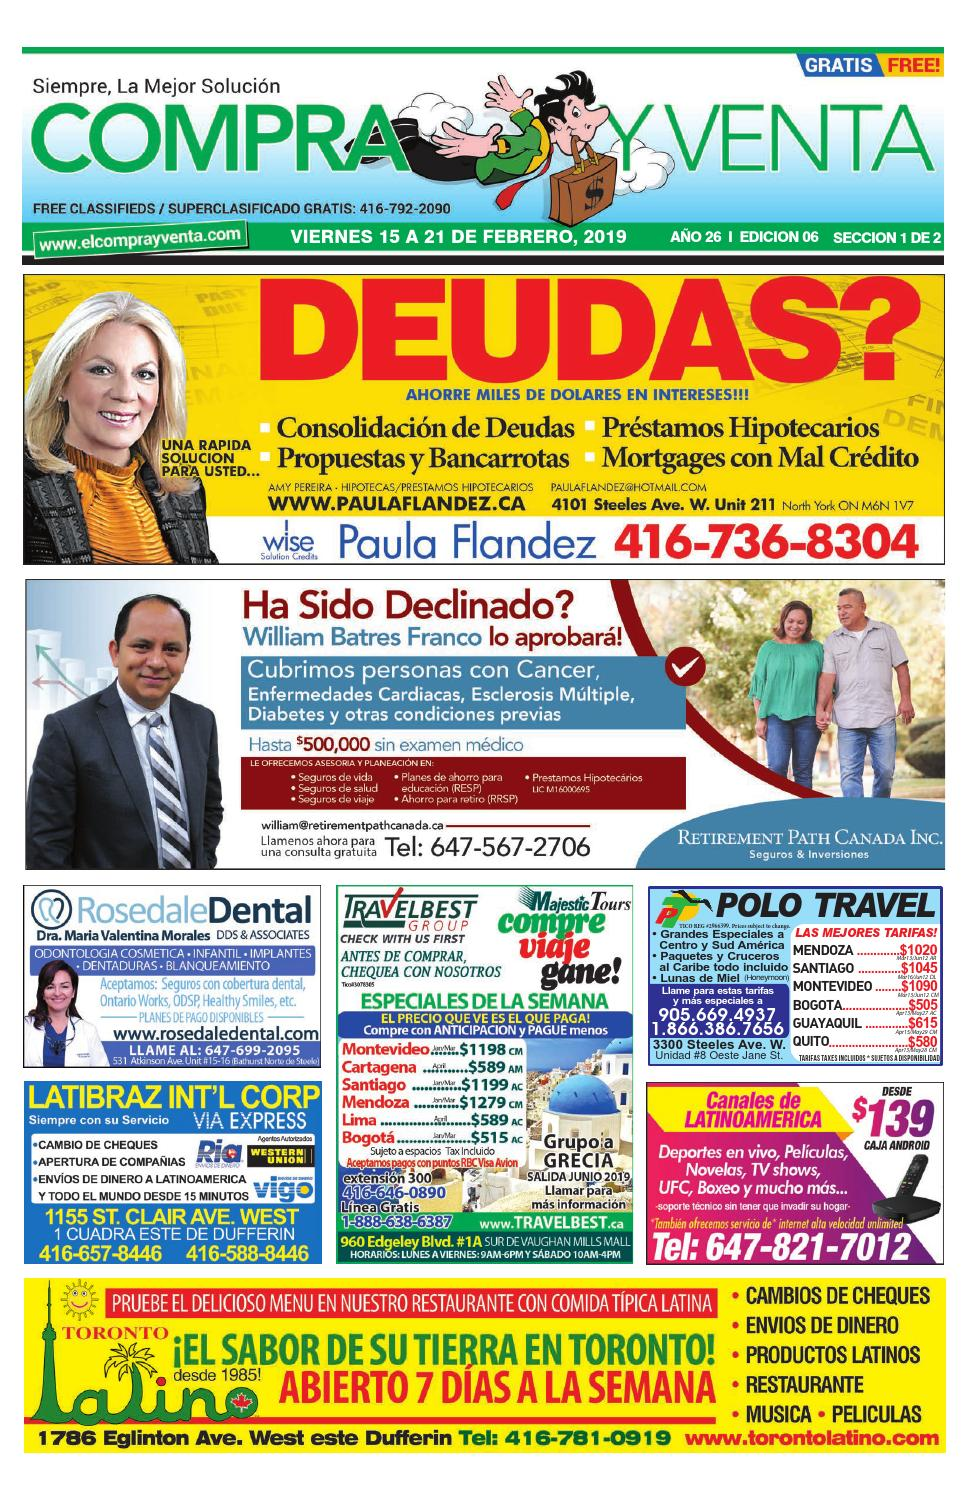 Compra y Venta Edicion  06. 2019 by elcomprayventa - issuu eb01204511f85